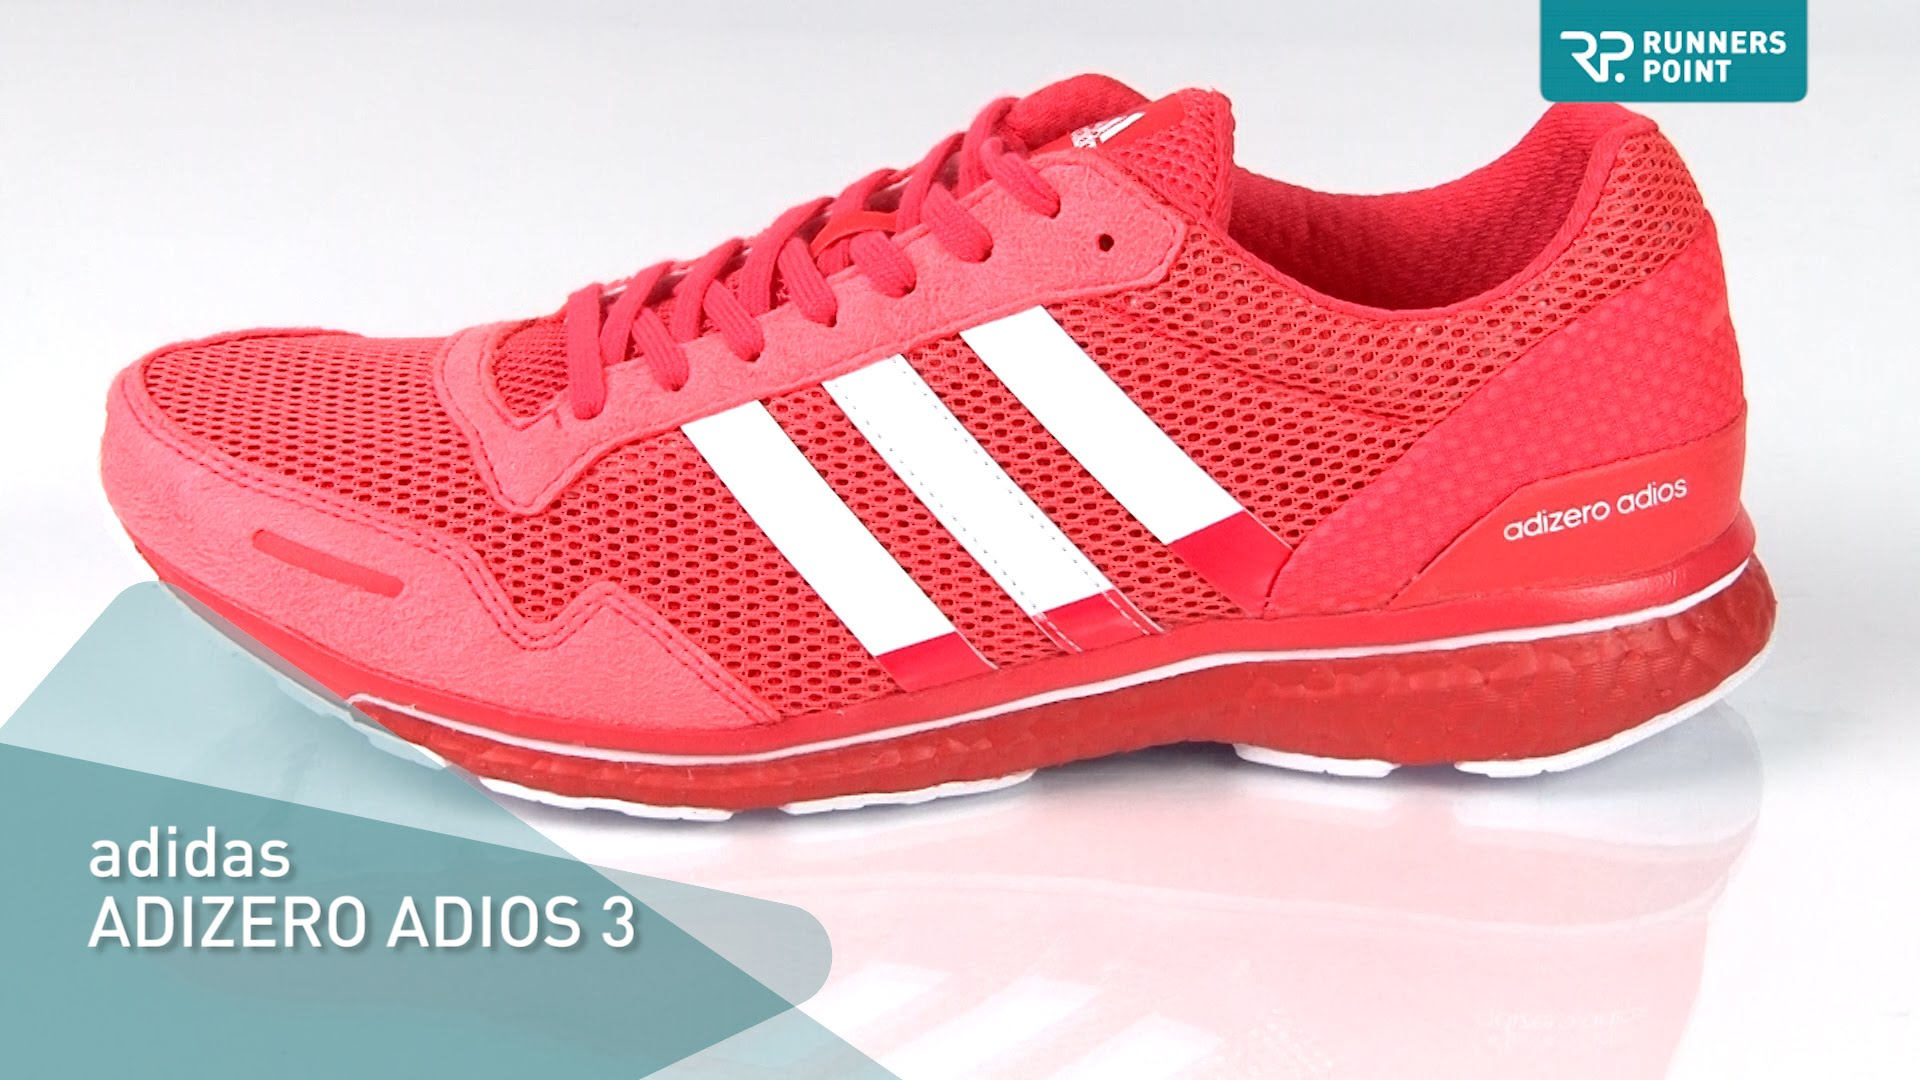 Adidas Adios | Adidas Adizero Adios Womens | Adizero Adios Boost Review